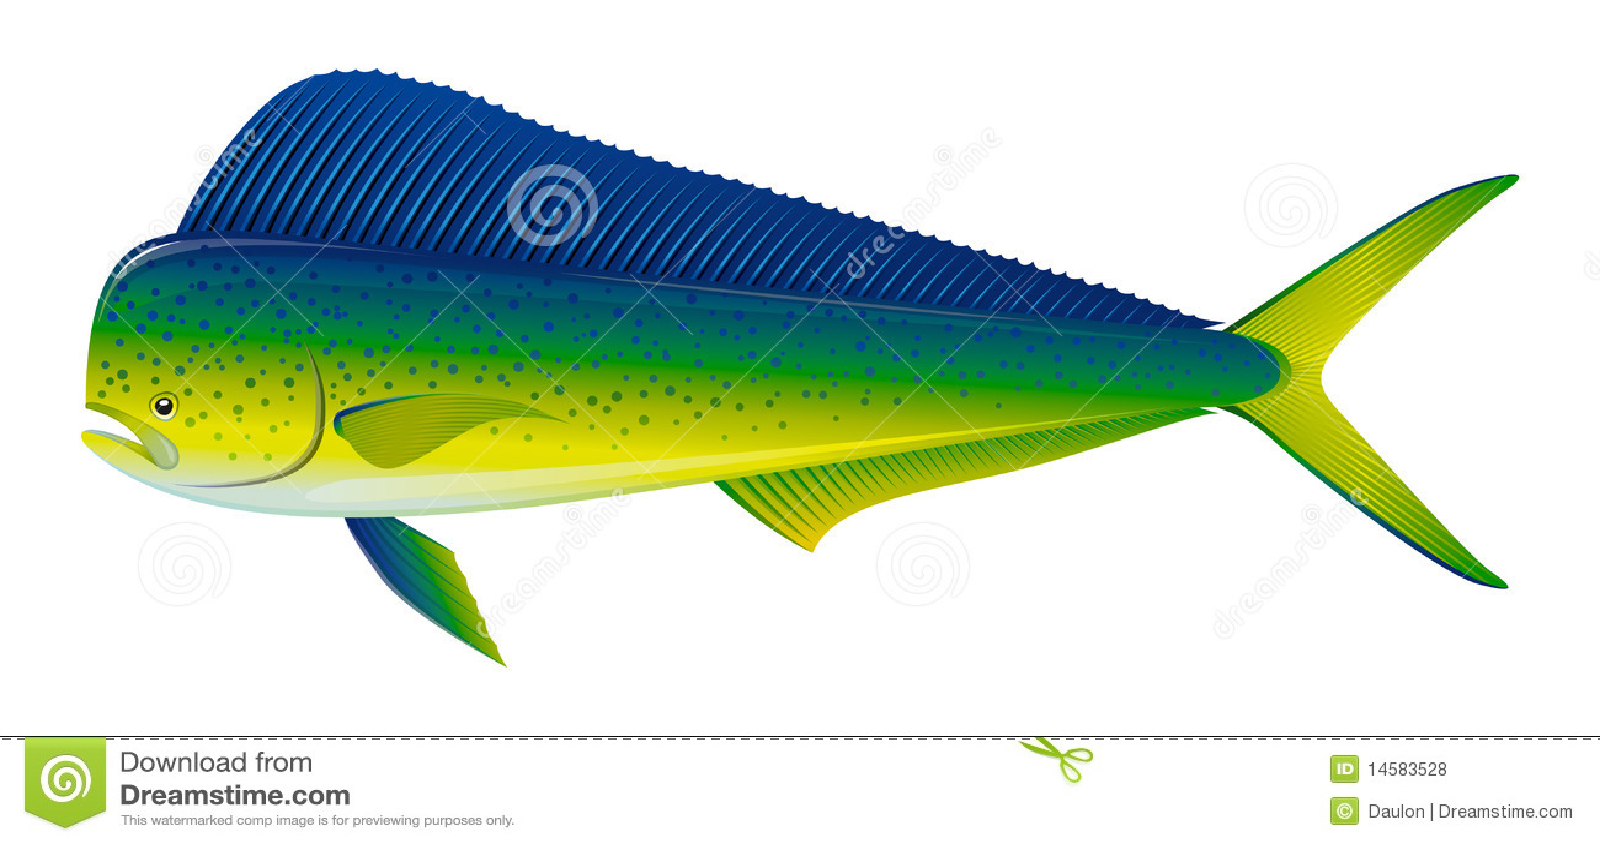 Mahi Name Wallpaper 3d Pescados De Dorado Fotos De Archivo Libres De Regal 237 As